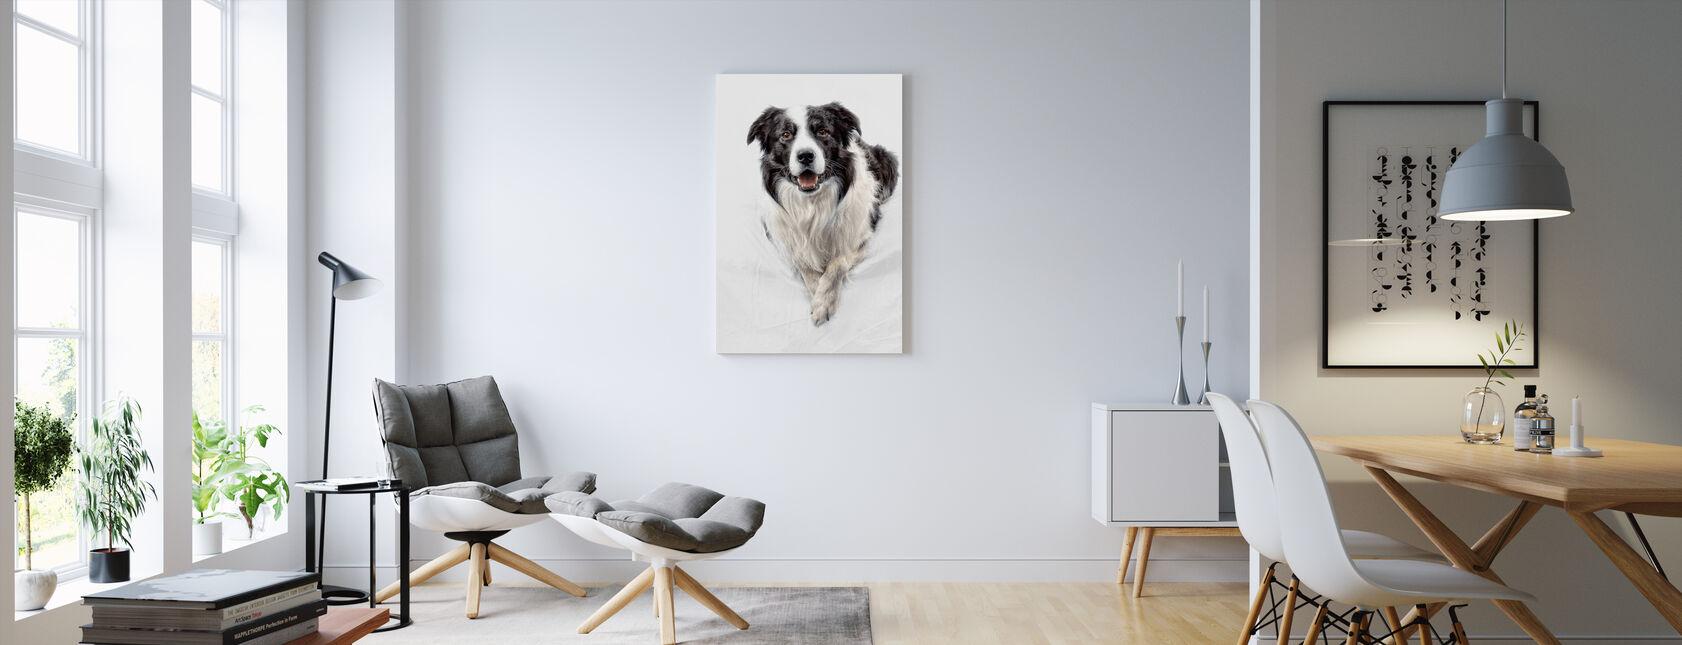 Border Collie - Canvas print - Living Room